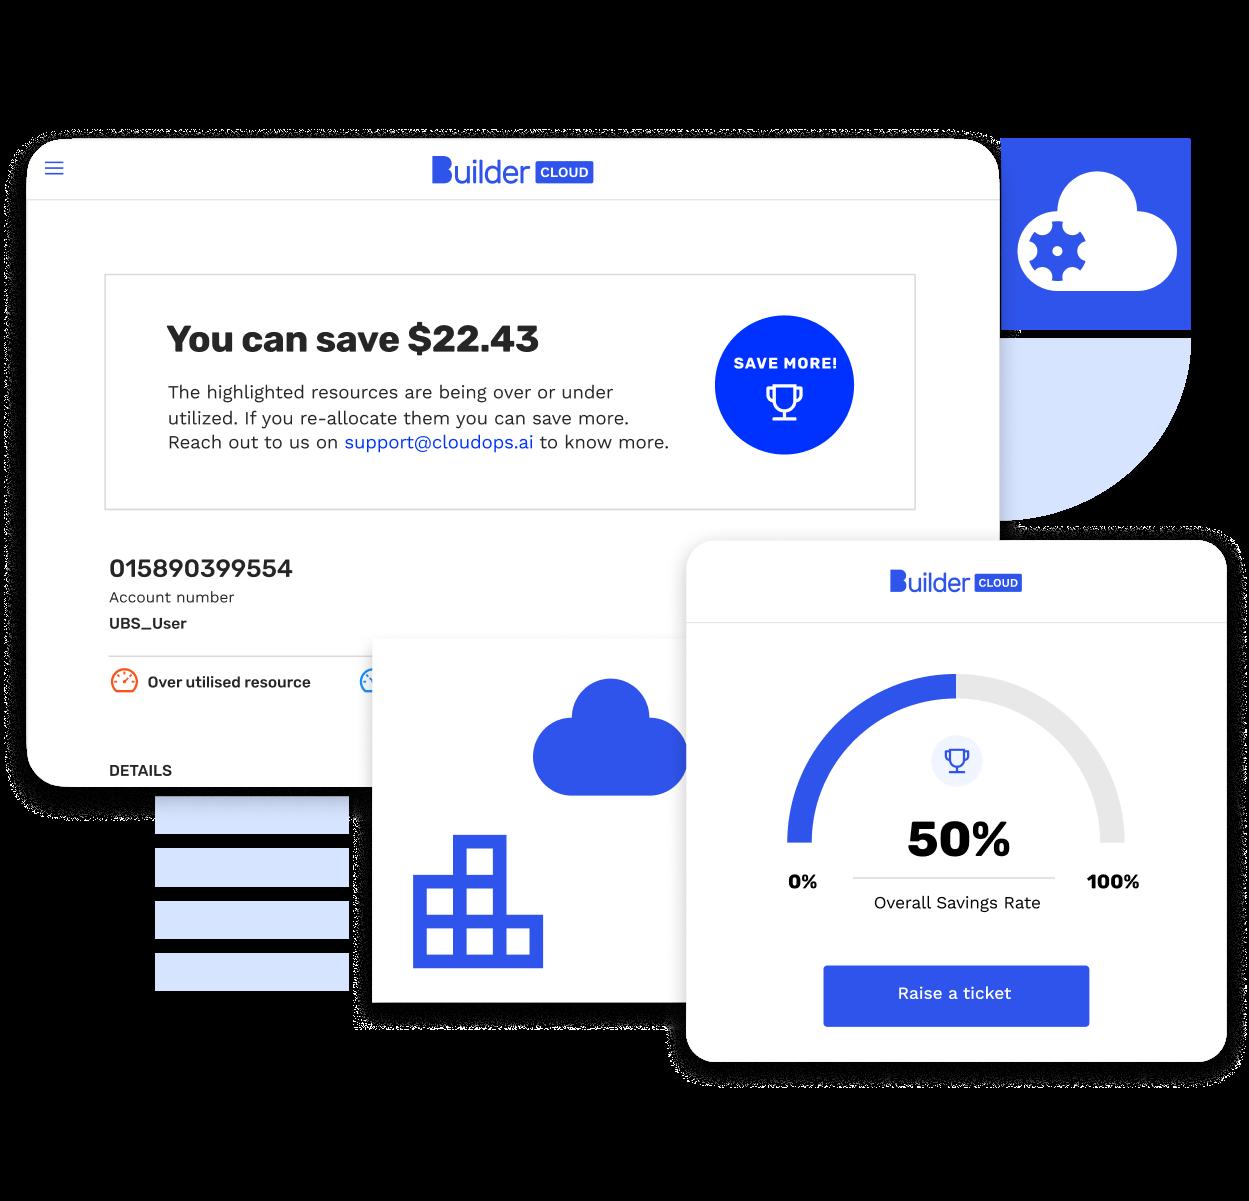 Builder Cloud dashboard